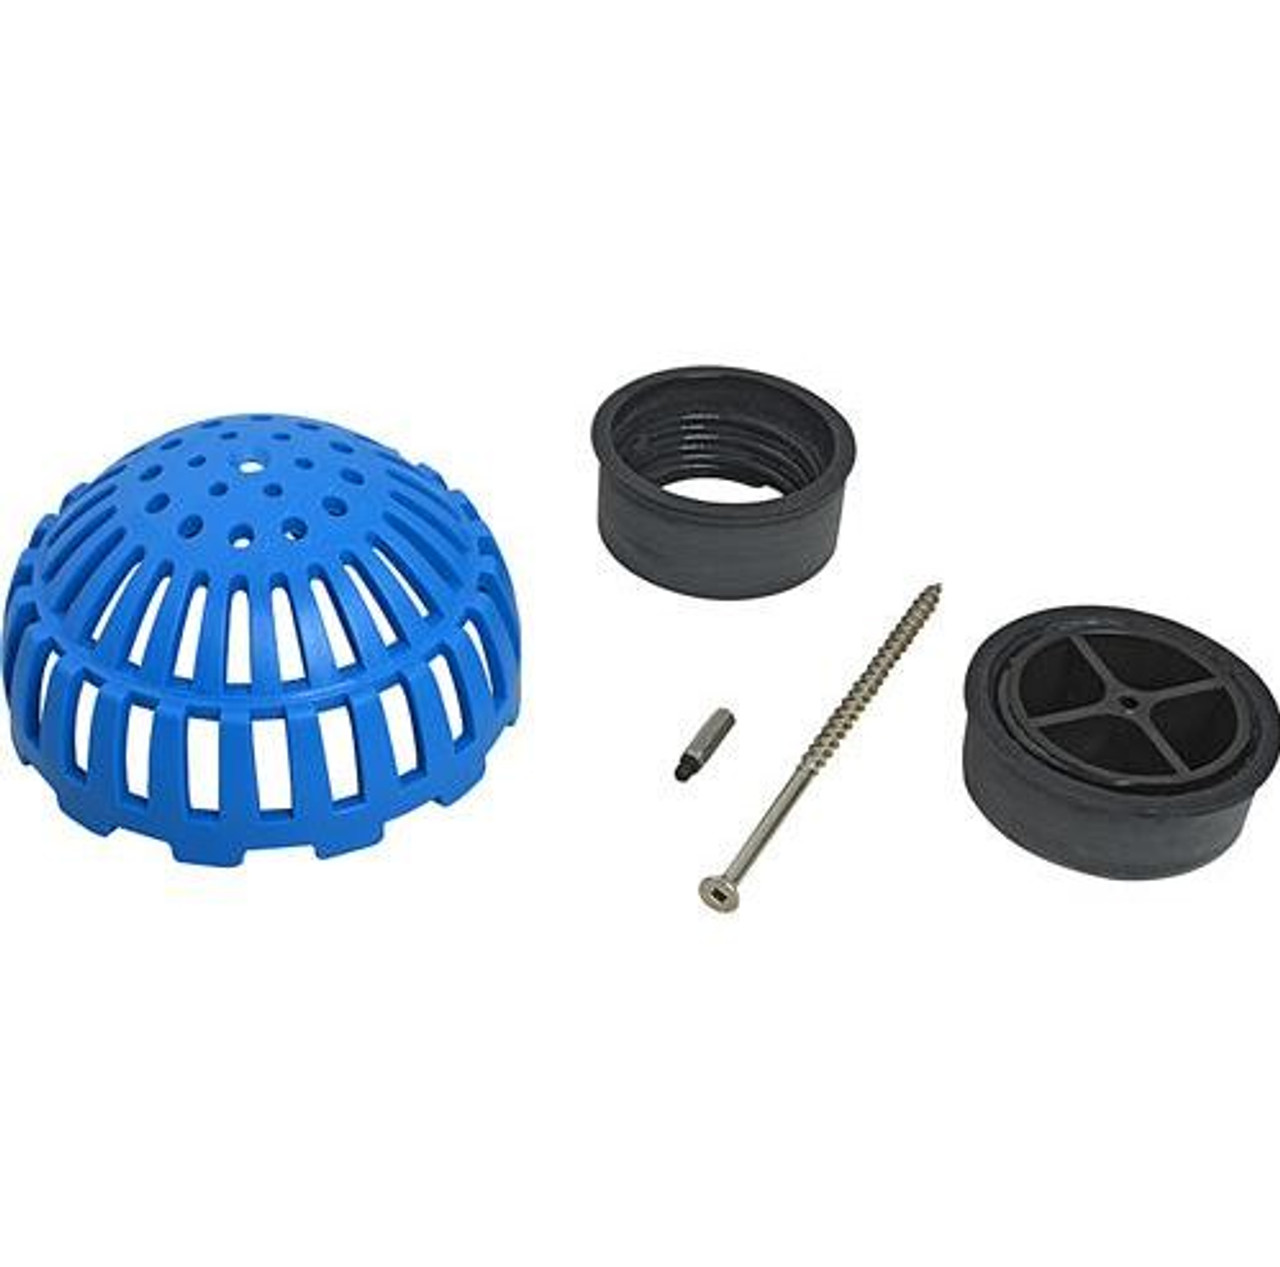 Locking Dome Strainer Kit - 4 inch